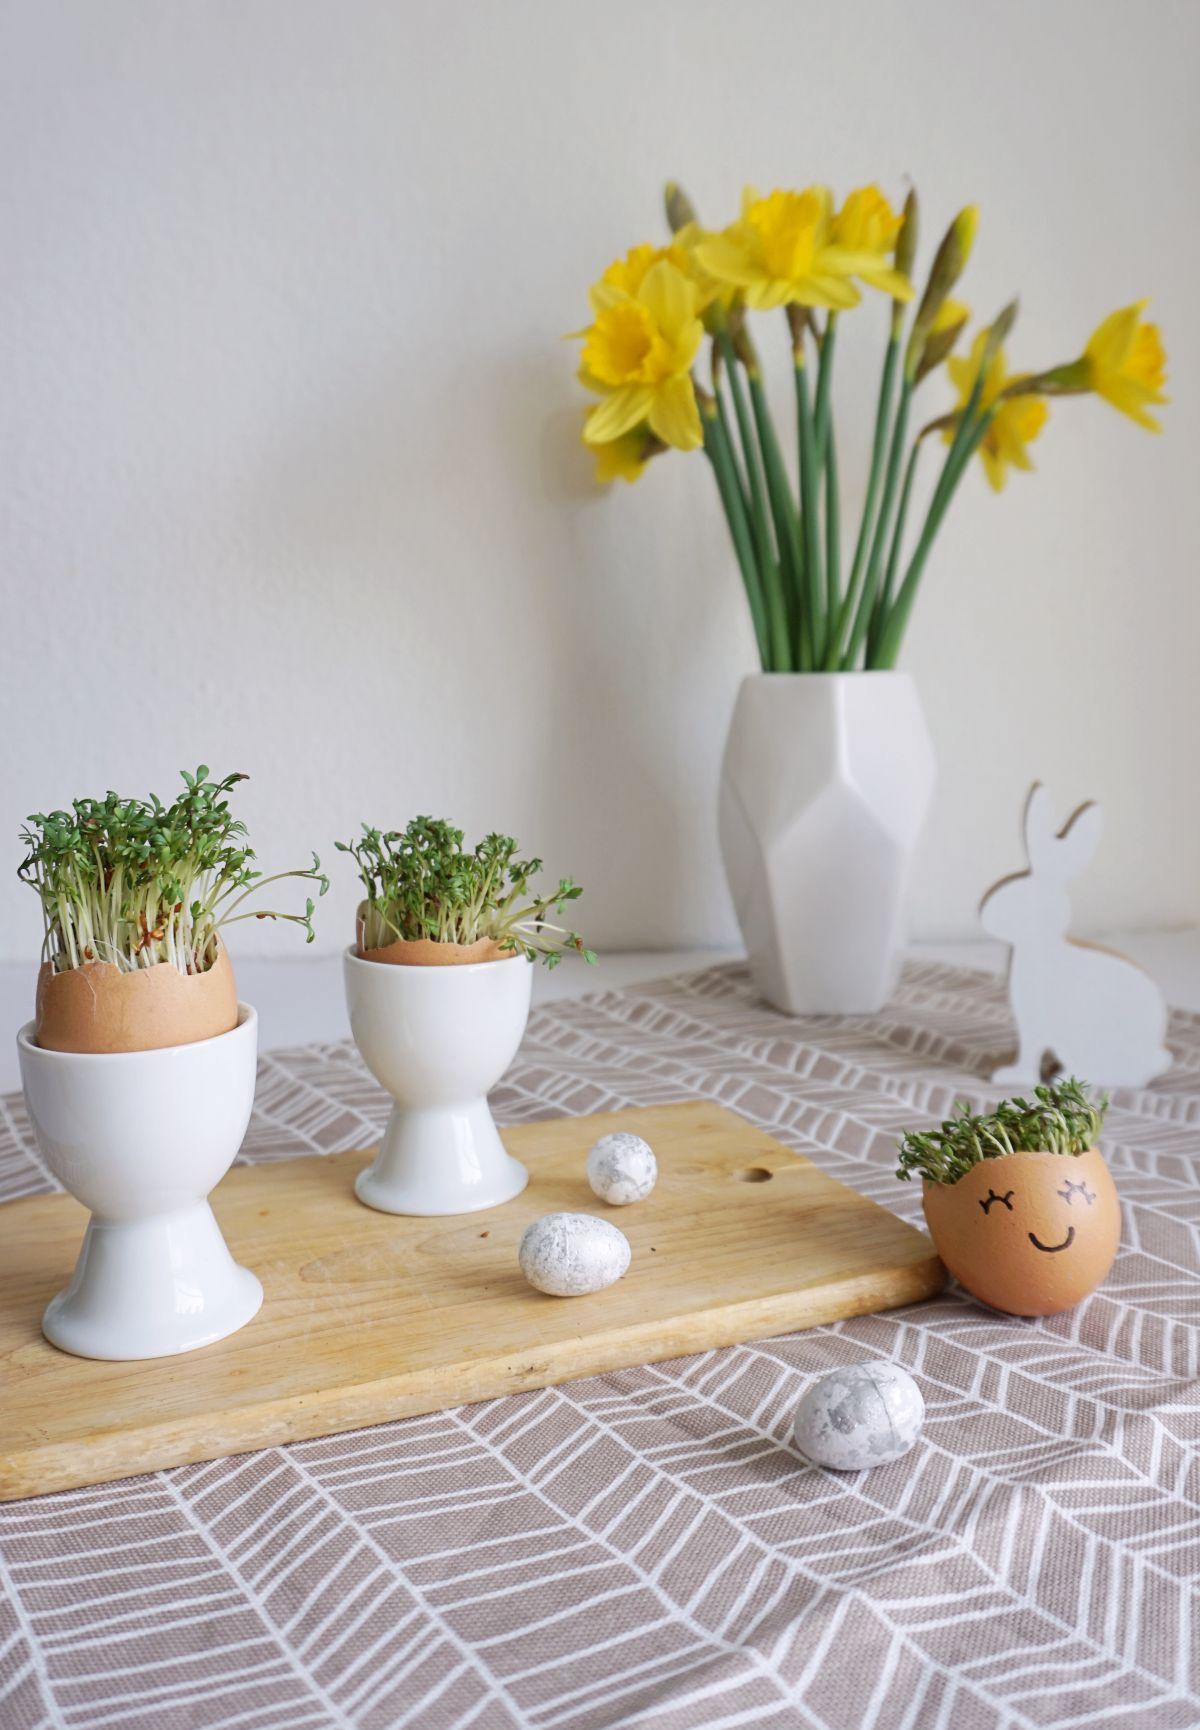 DIY Wielkanocna dekoracja ze skorupek jaj